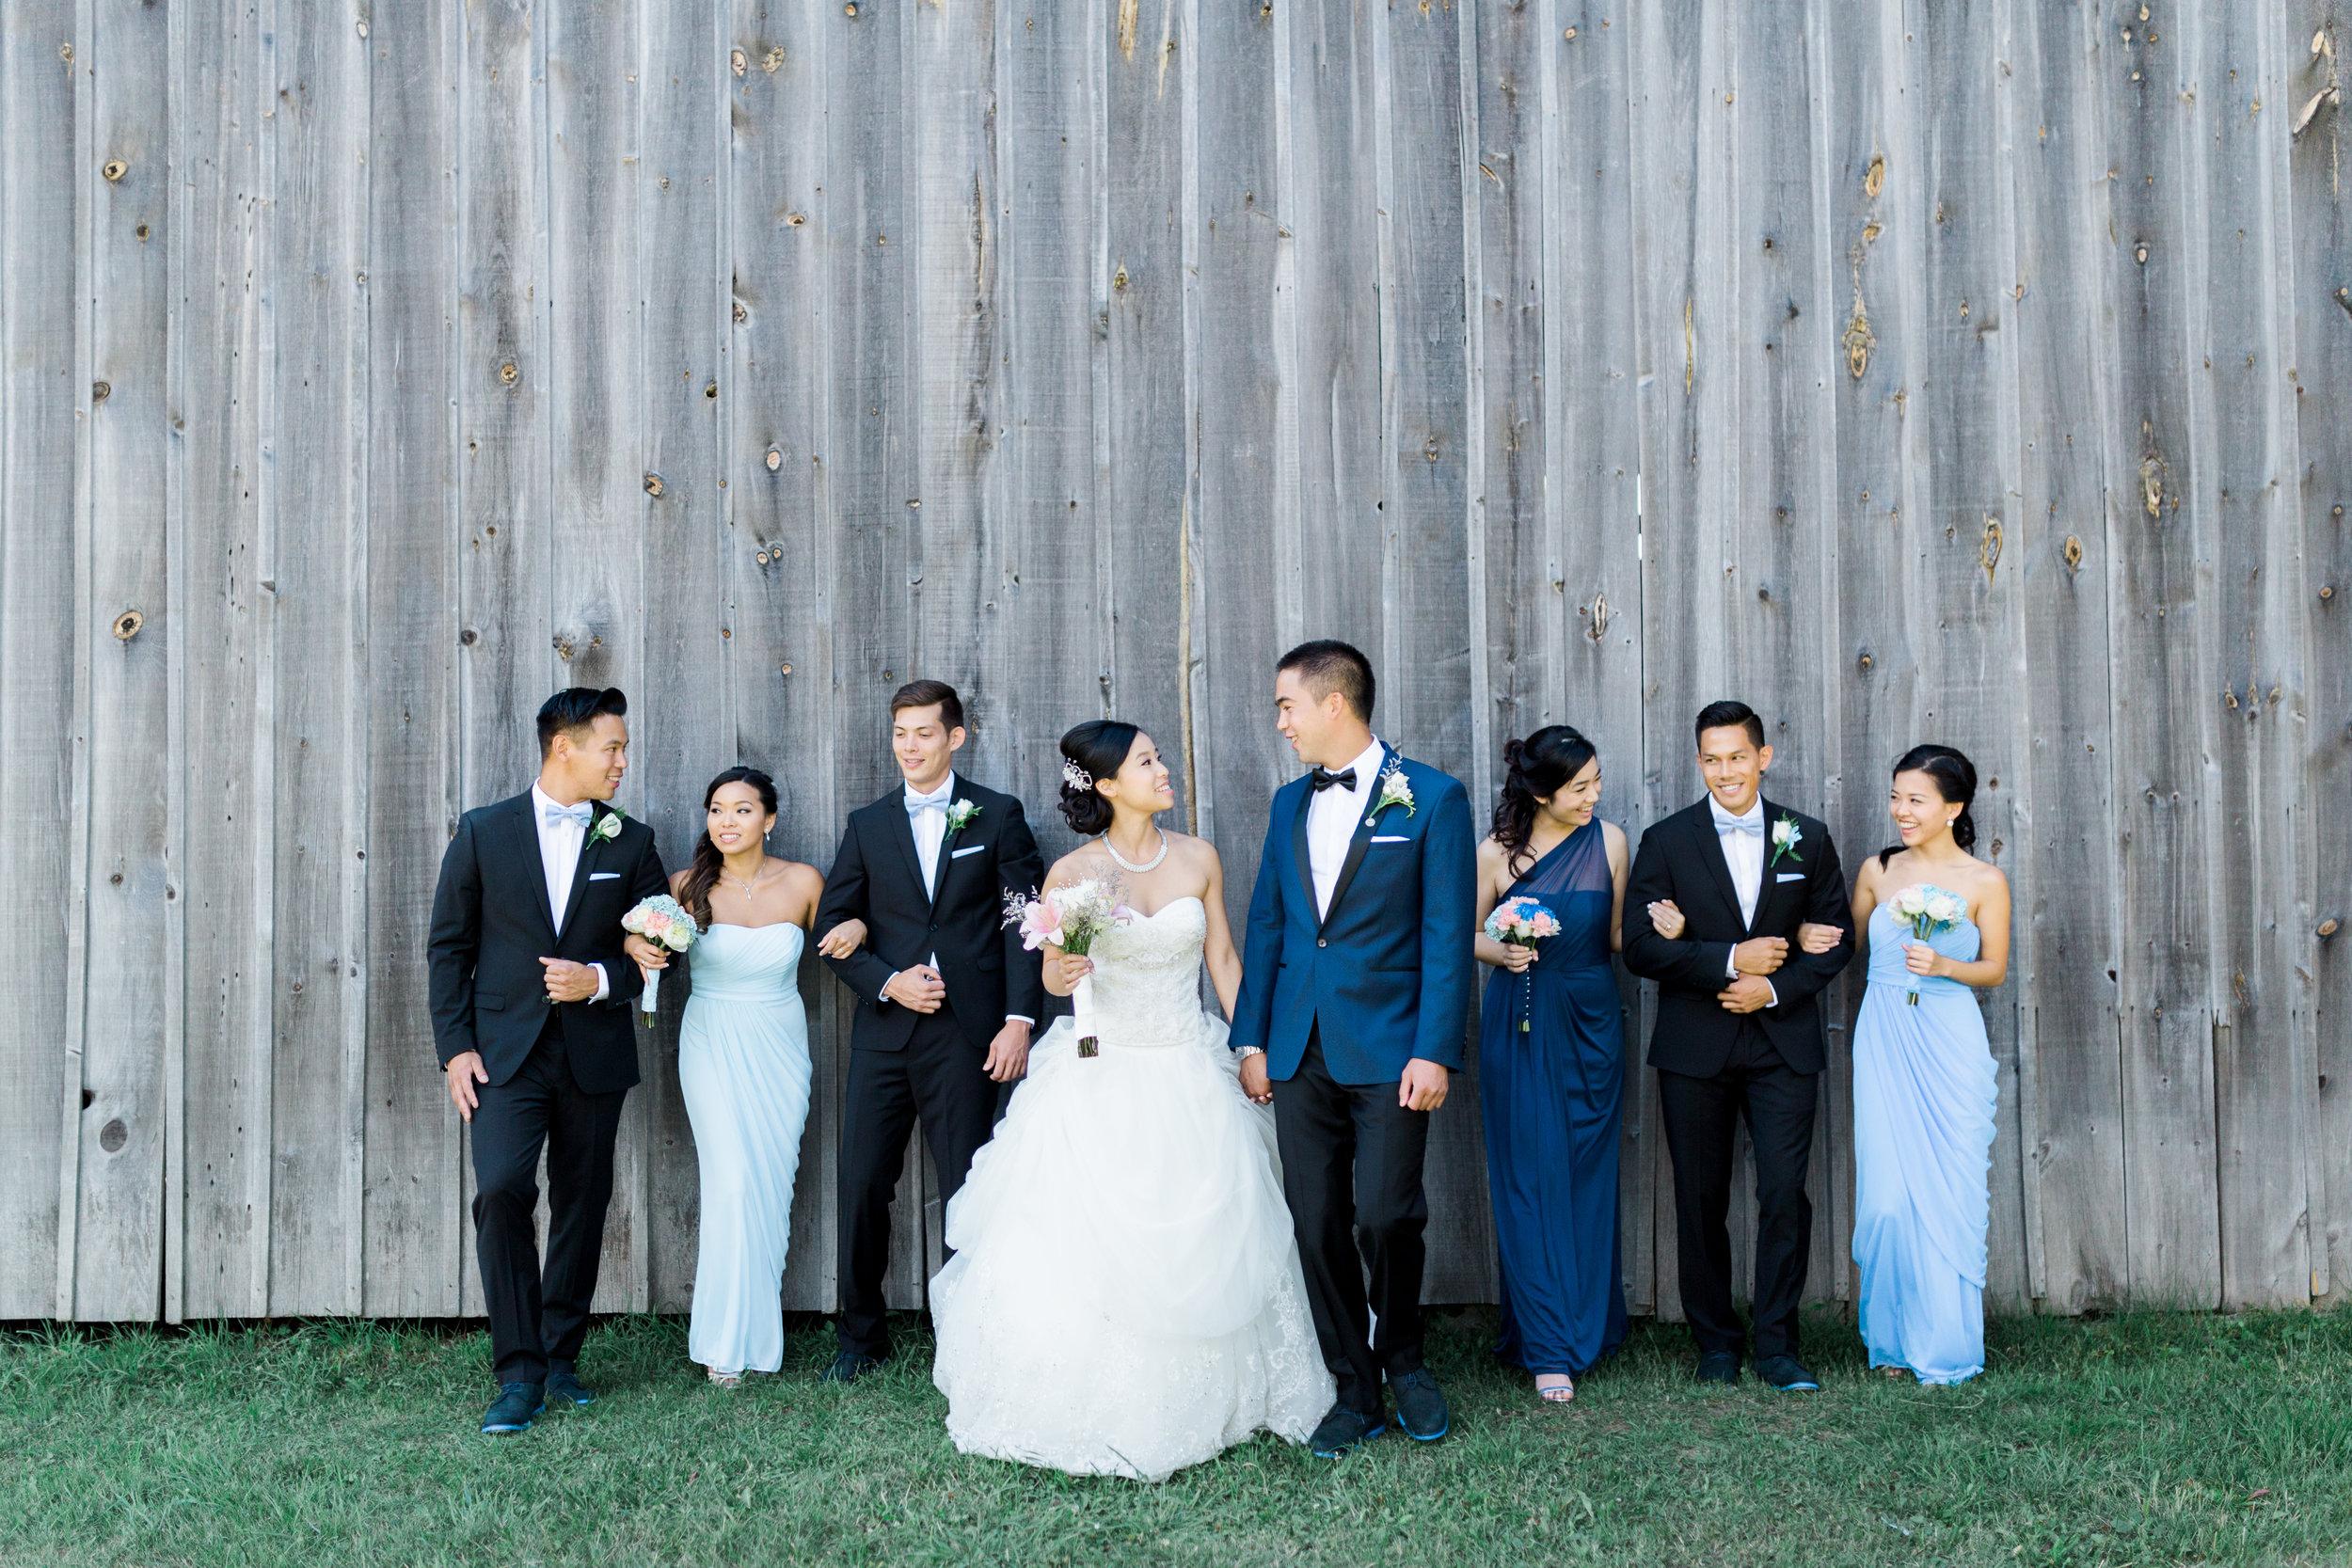 Toronto Fine Art Photographer - Markham Museum Wedding - Bridal Party Portraits-21.jpg